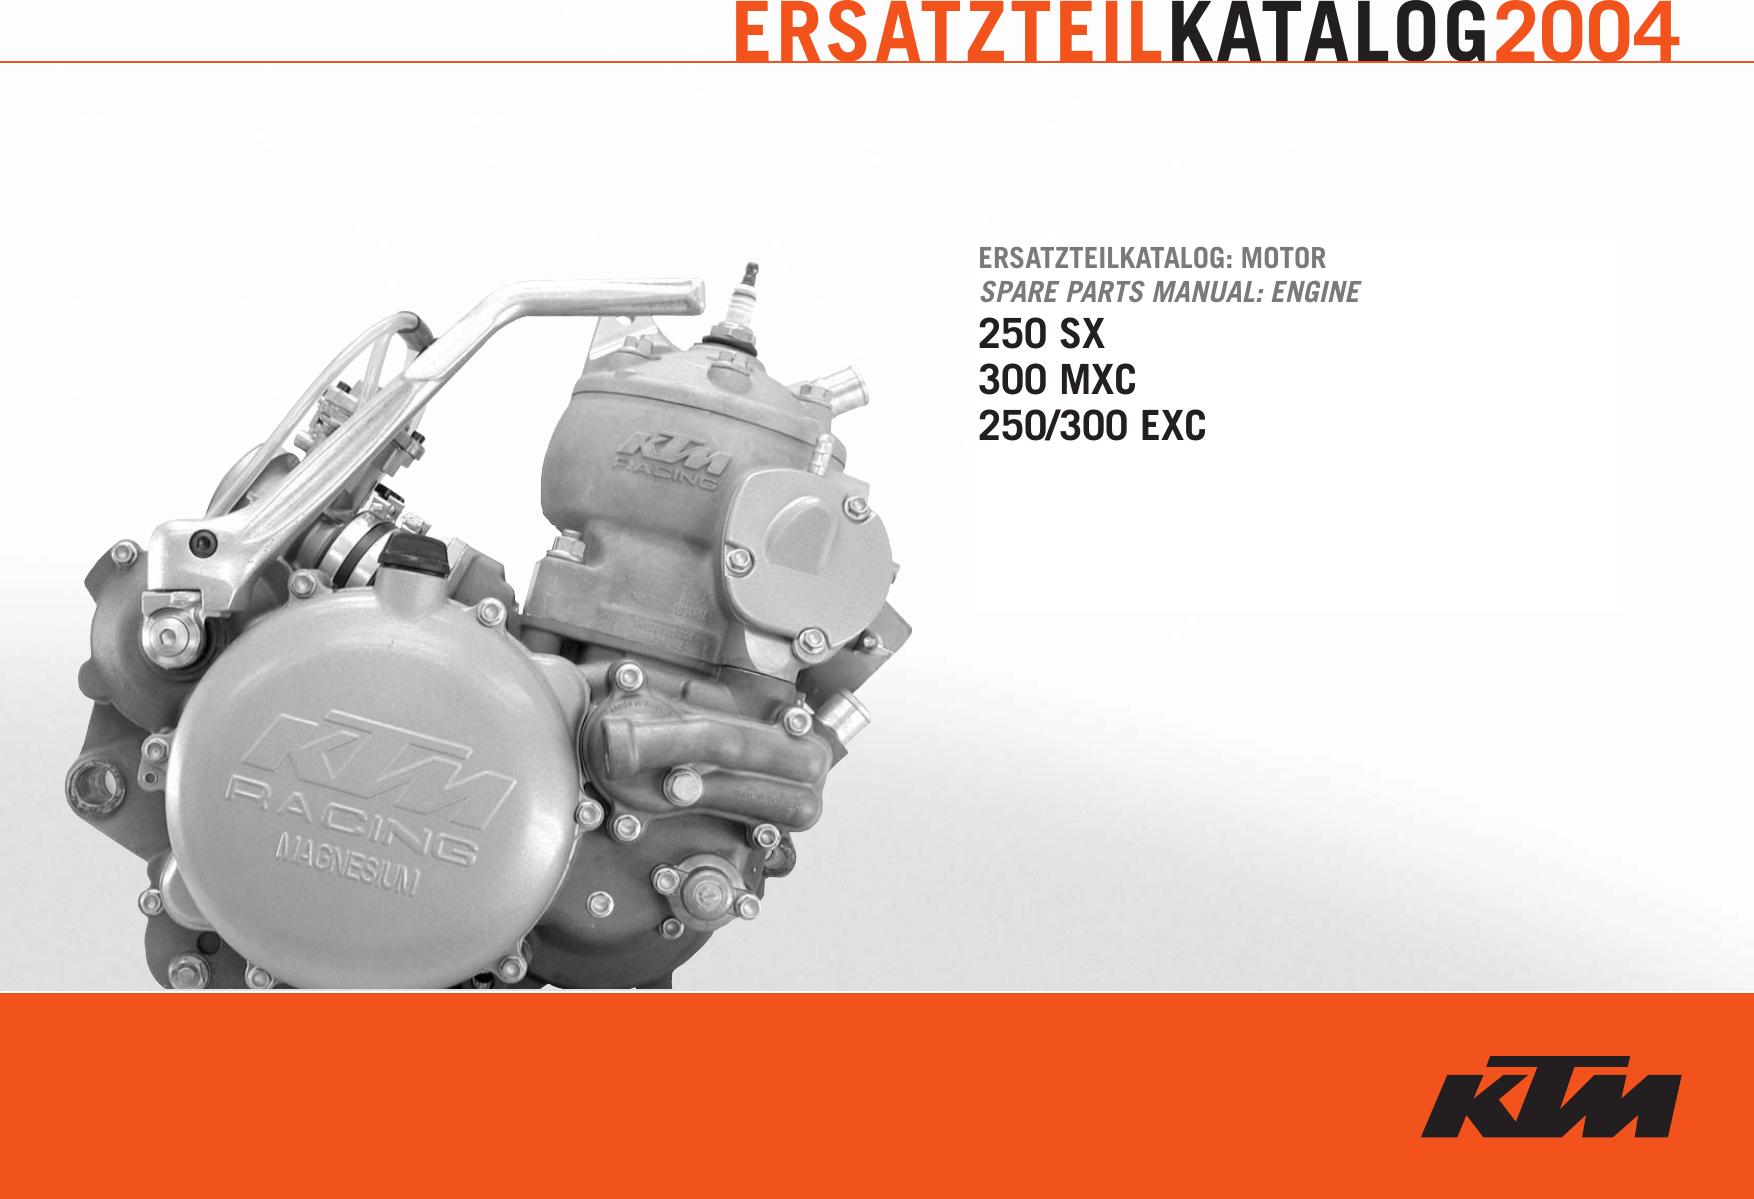 Ktm Racing Engine 250 Sx Users Manual ETK_MO_250_300_2004